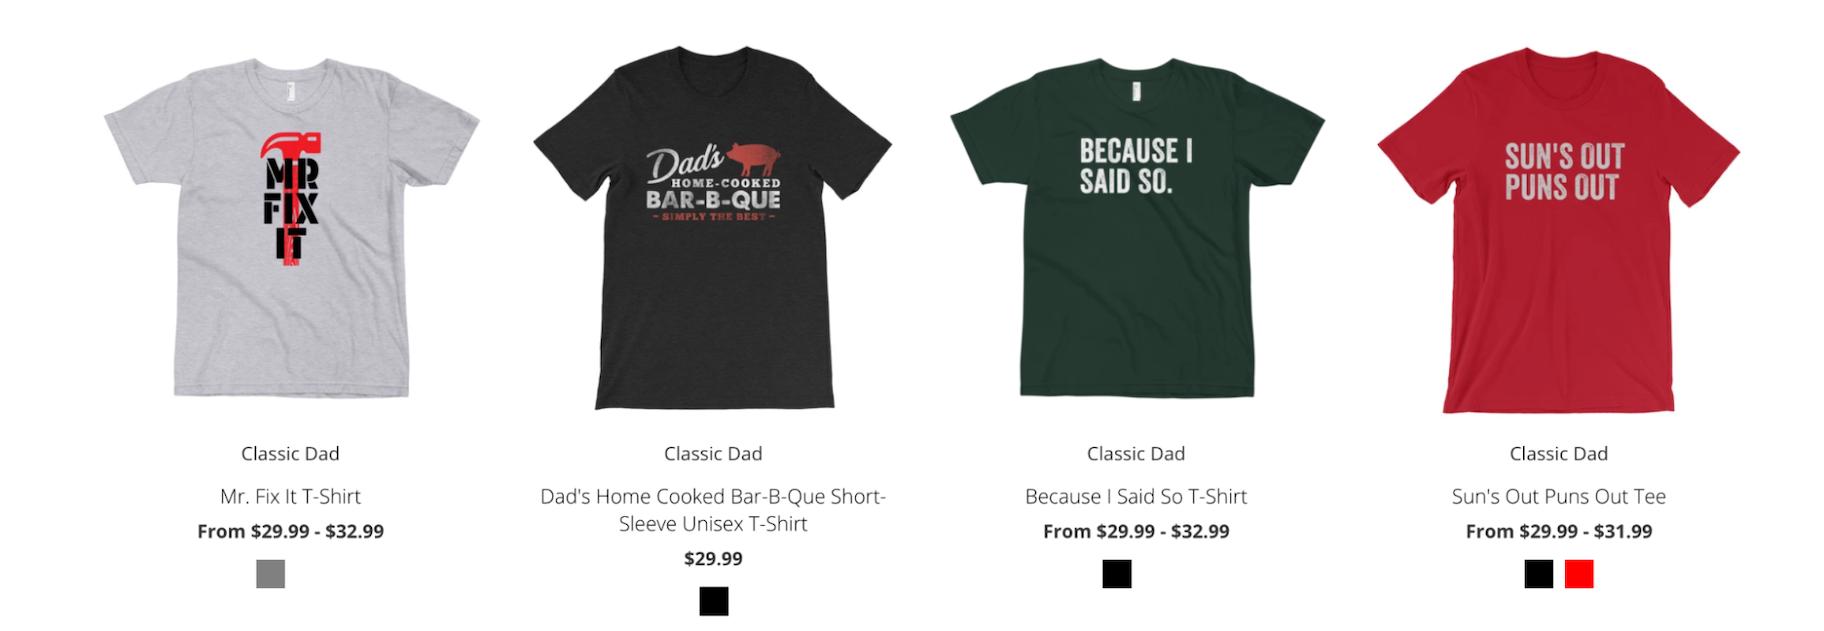 Print-on-Demand T-Shirts: Classic Dad